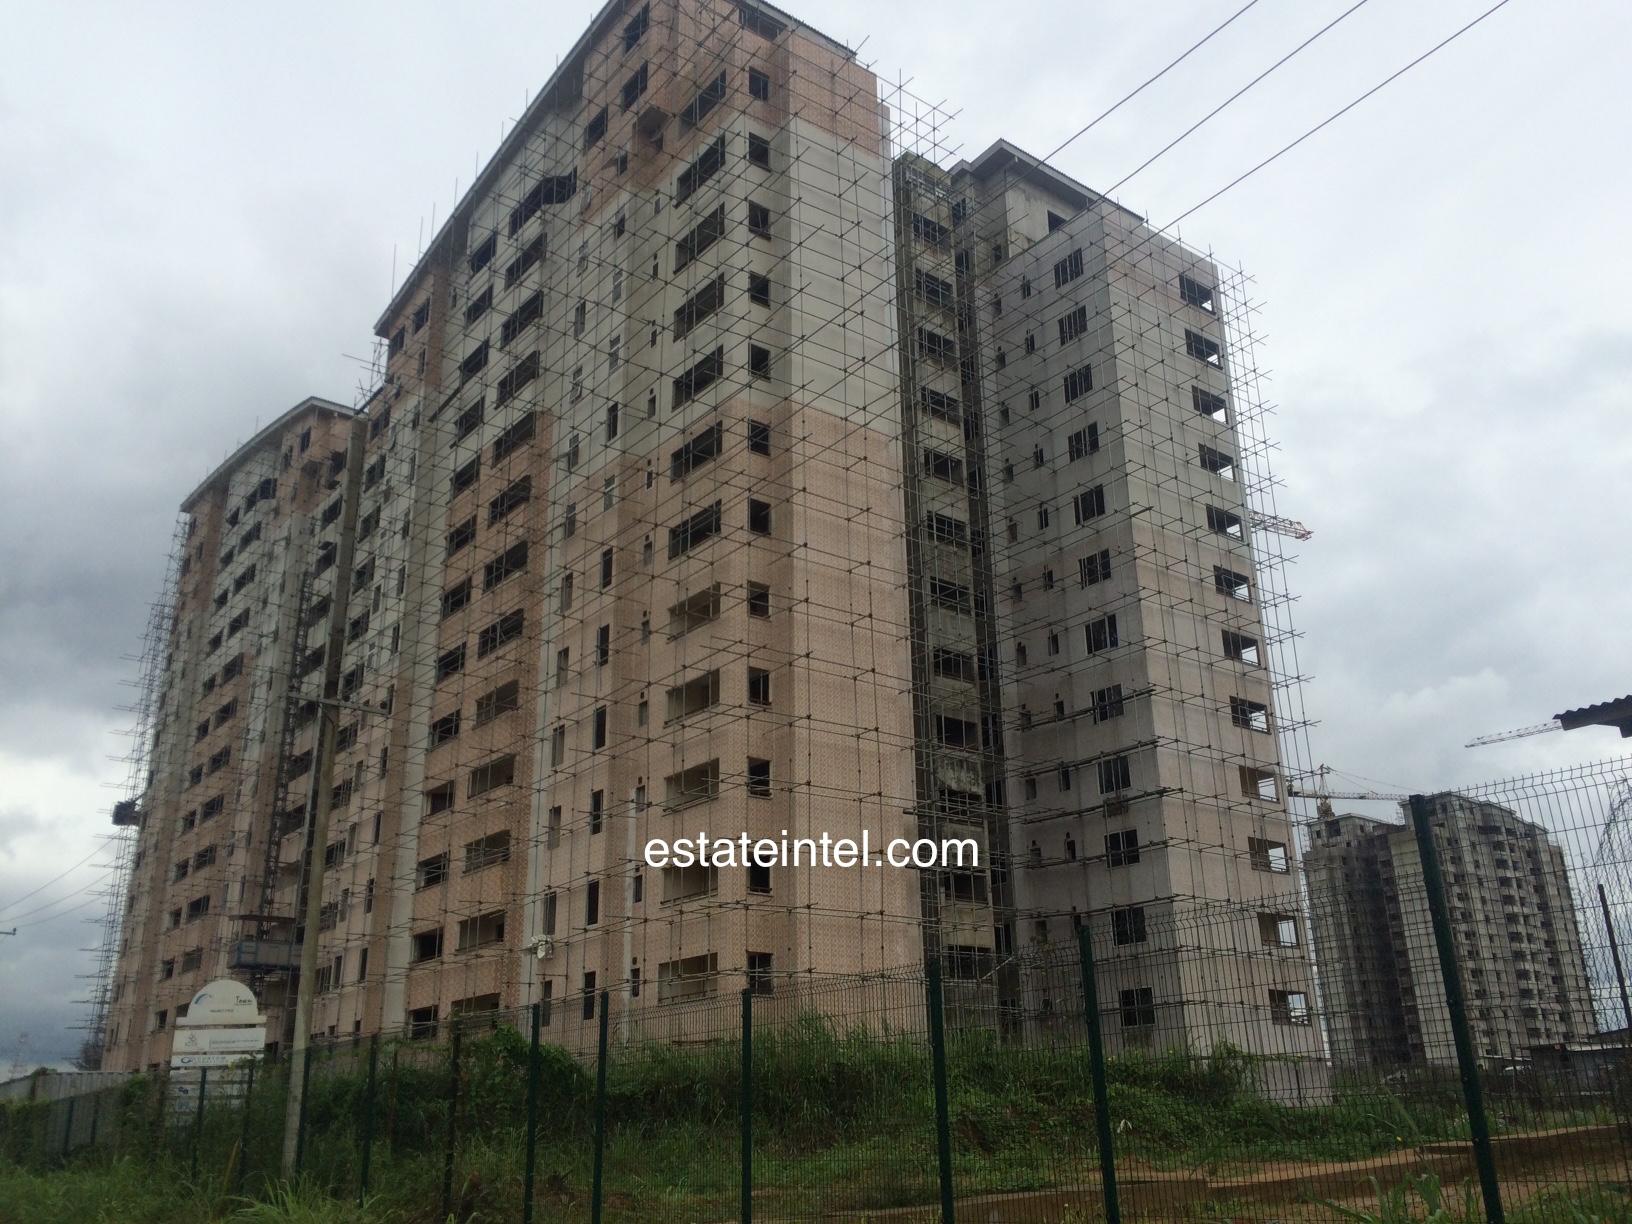 Point Block Tower - Rainbow Town, Port Harcourt. Image Source: estateintel.com